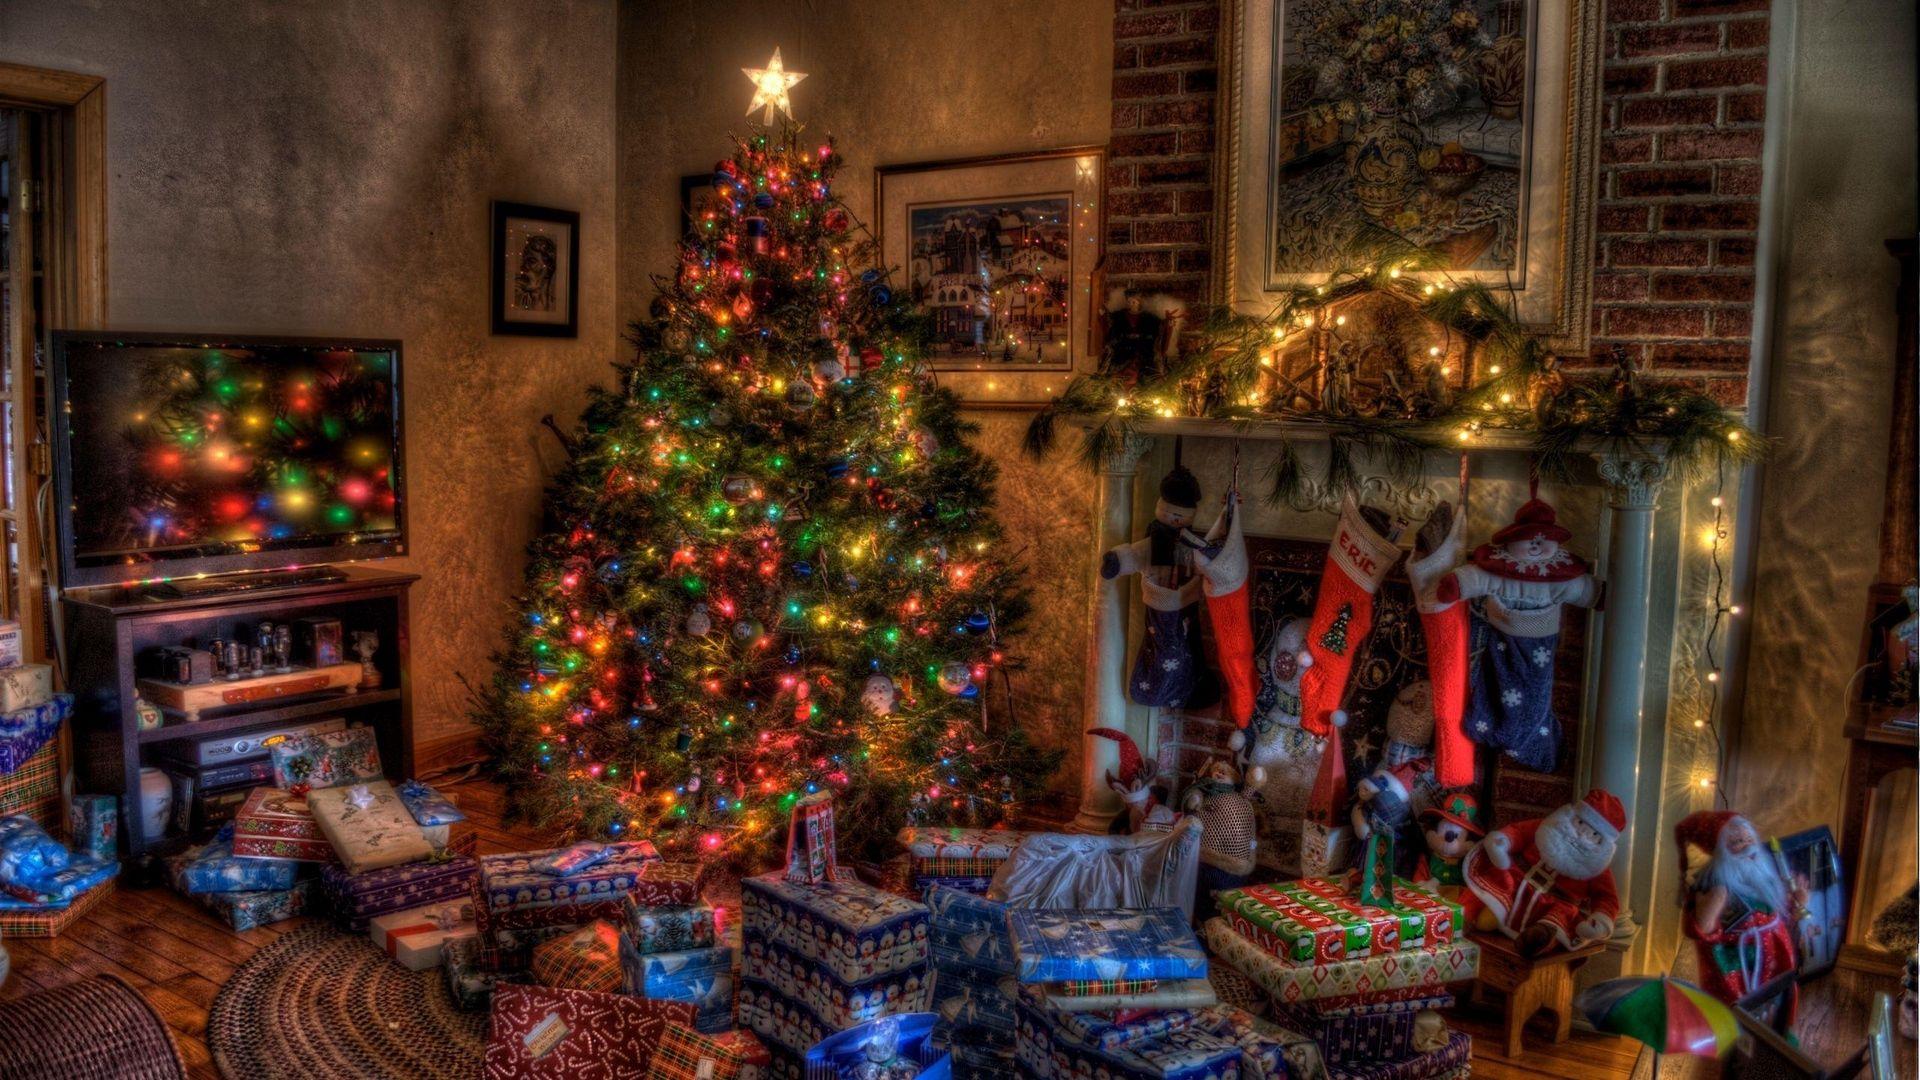 Christmas Fireplace Comfort Good Wallpaper